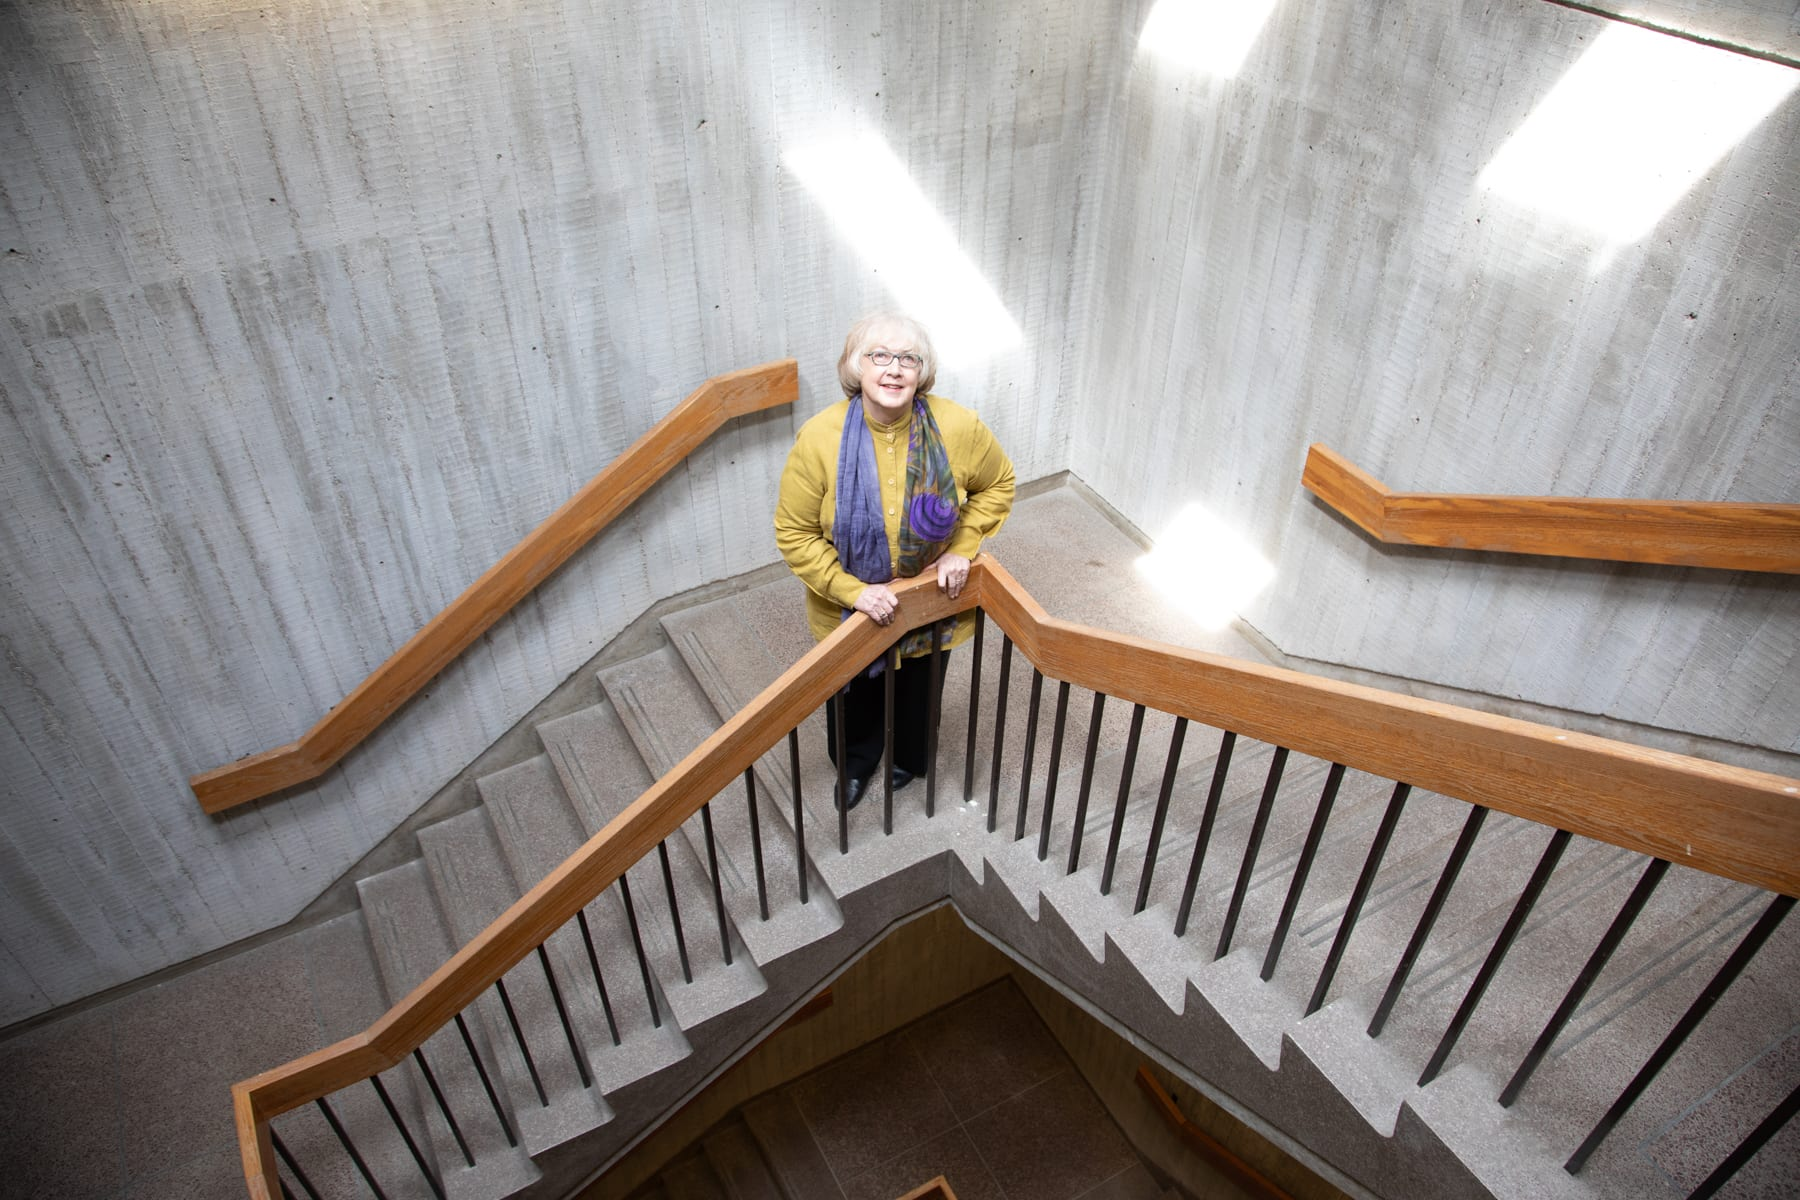 York University Faculty of Health Professor, Carol Wilson